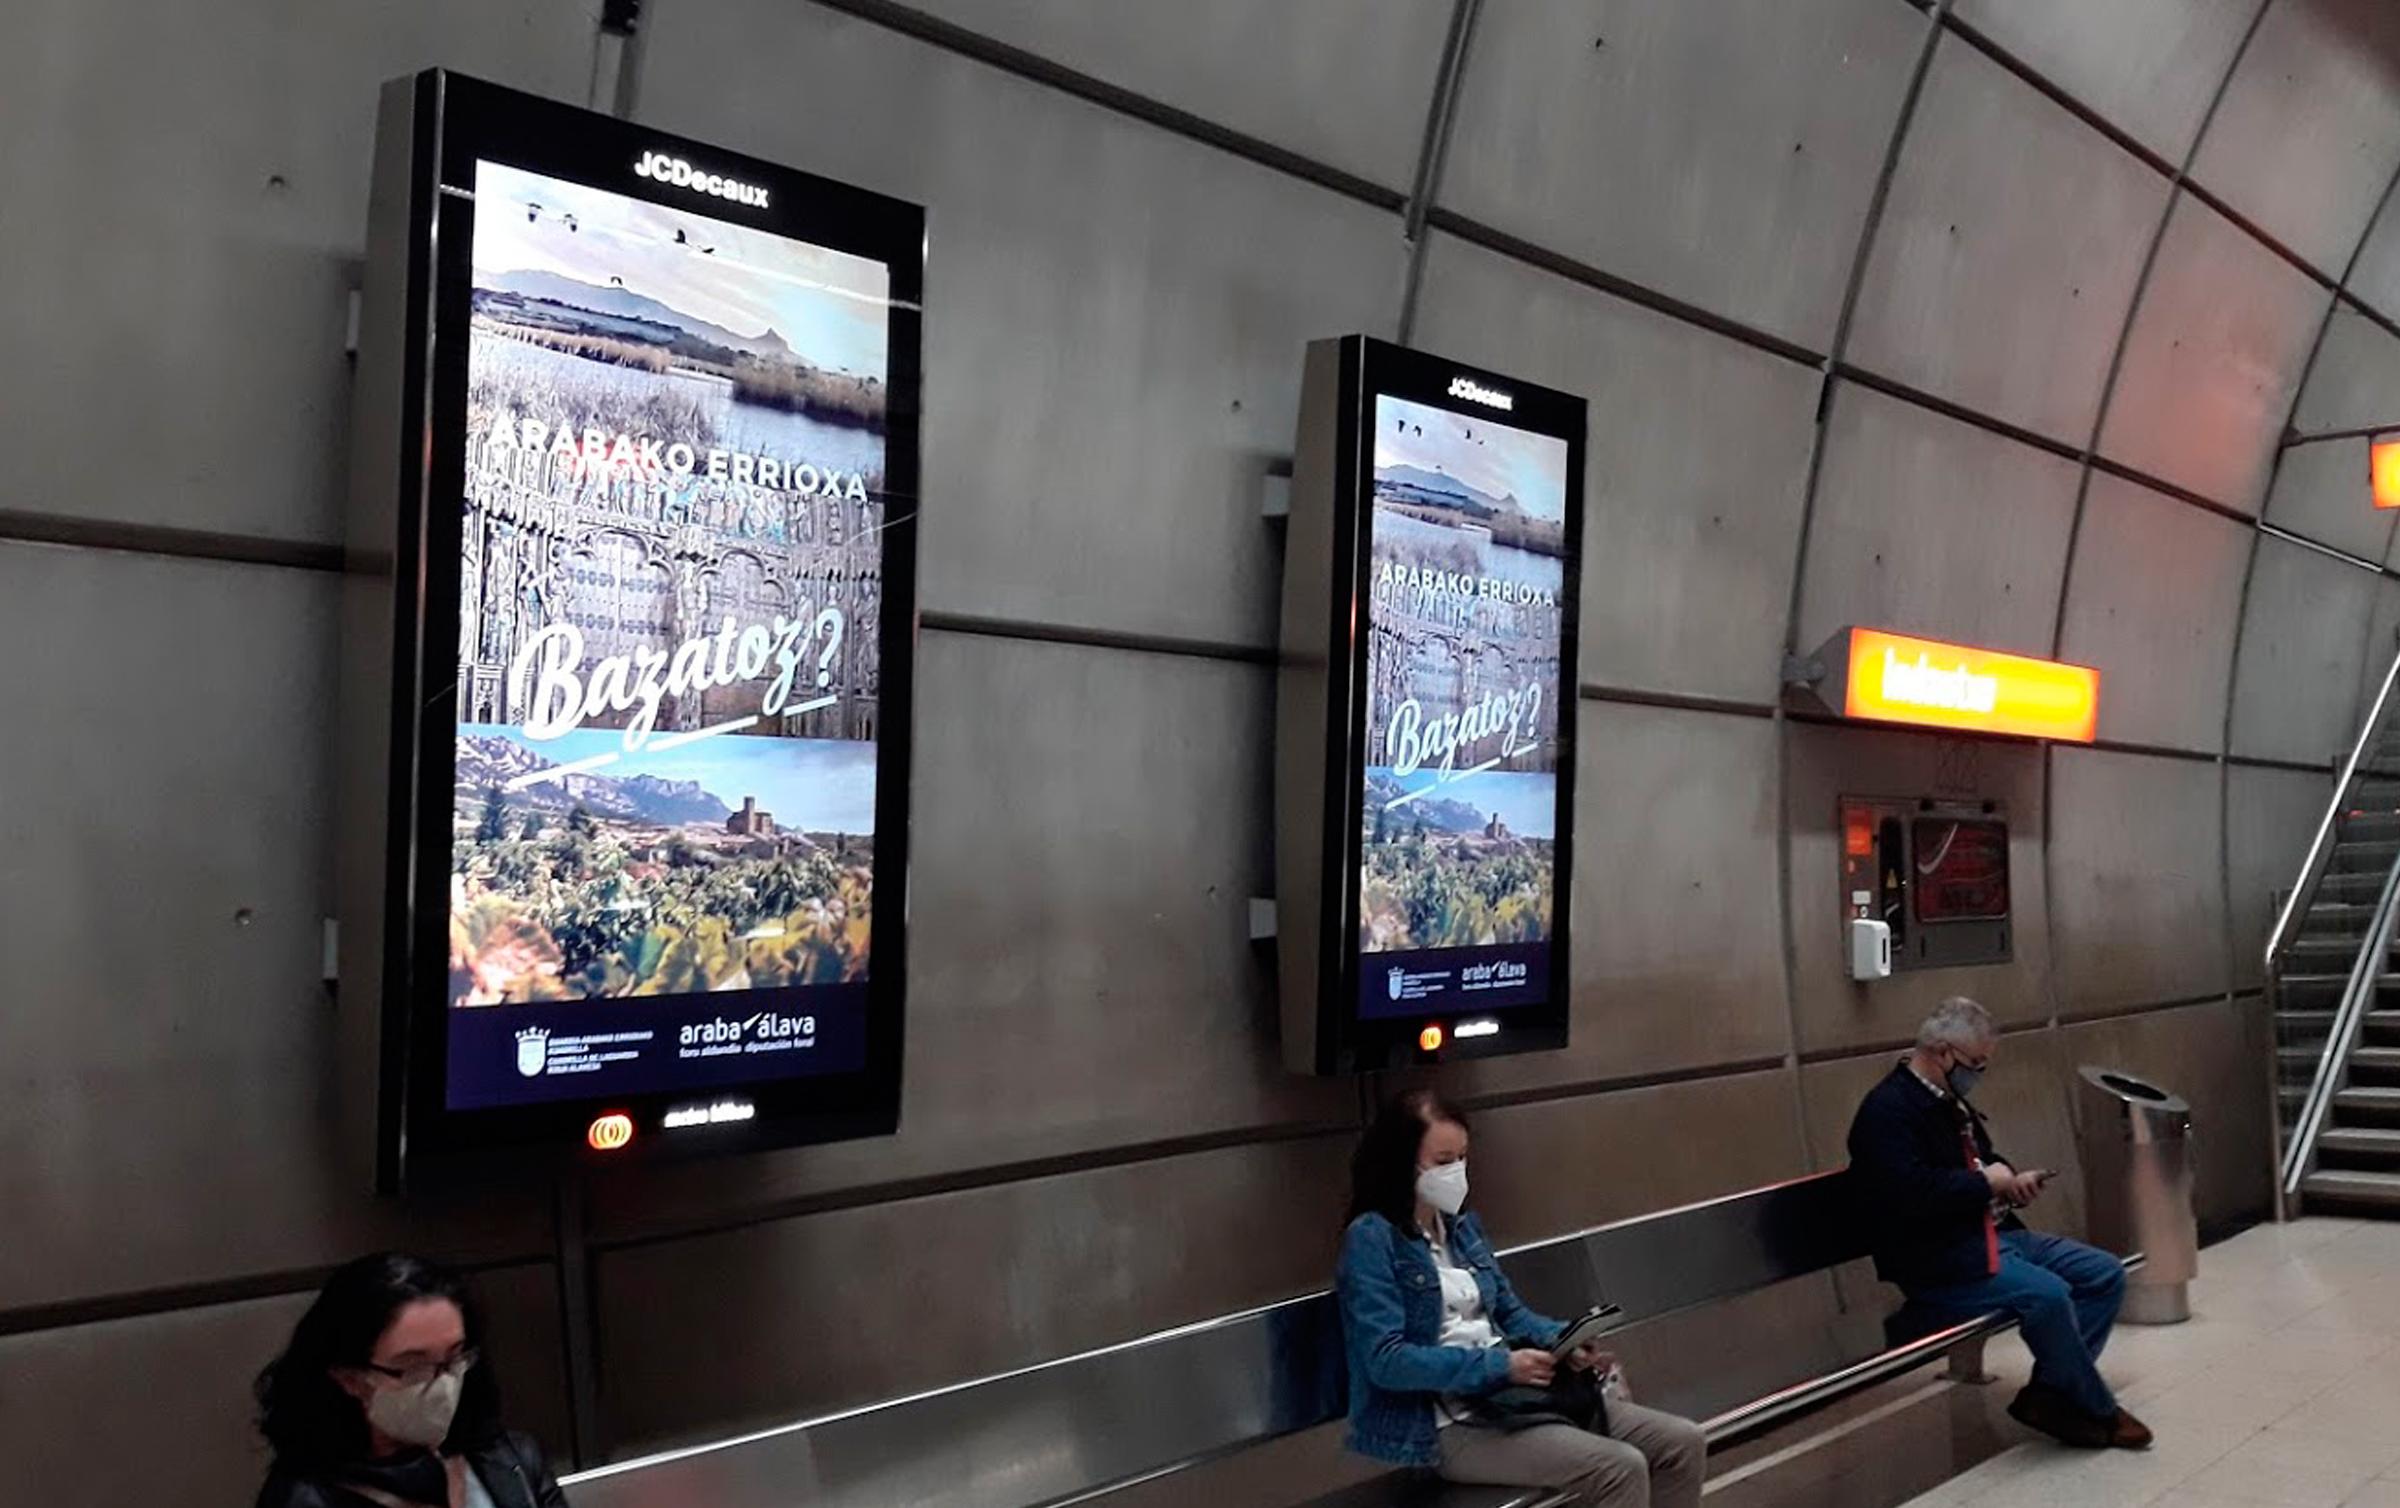 Cuadrilla de Rioja Alavesa – Campaña de promoción turística – Metro Bilbao